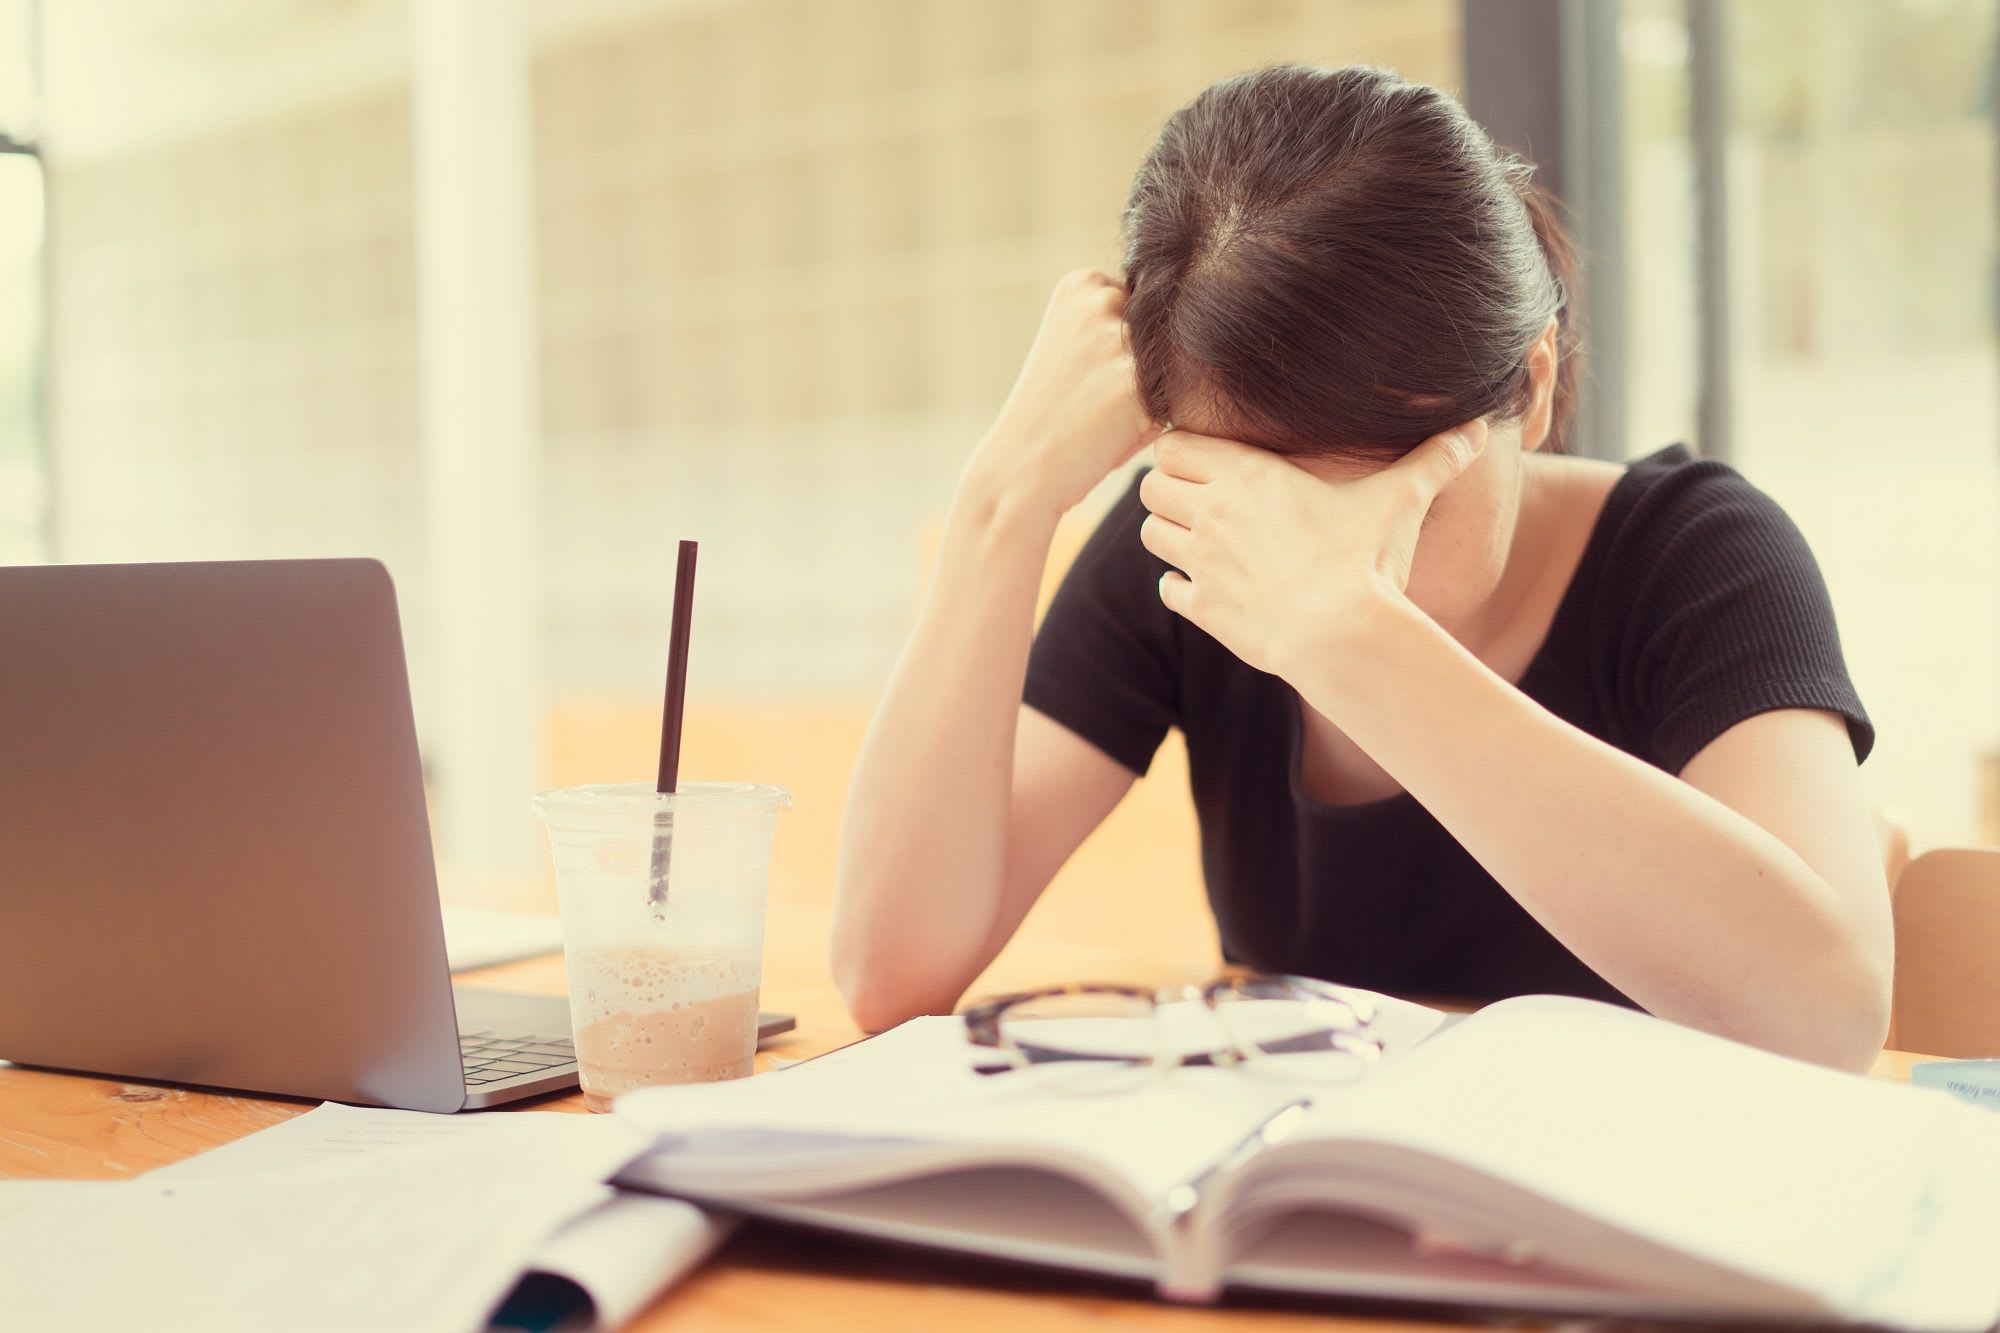 Underdiagnosis of ADHD in Women